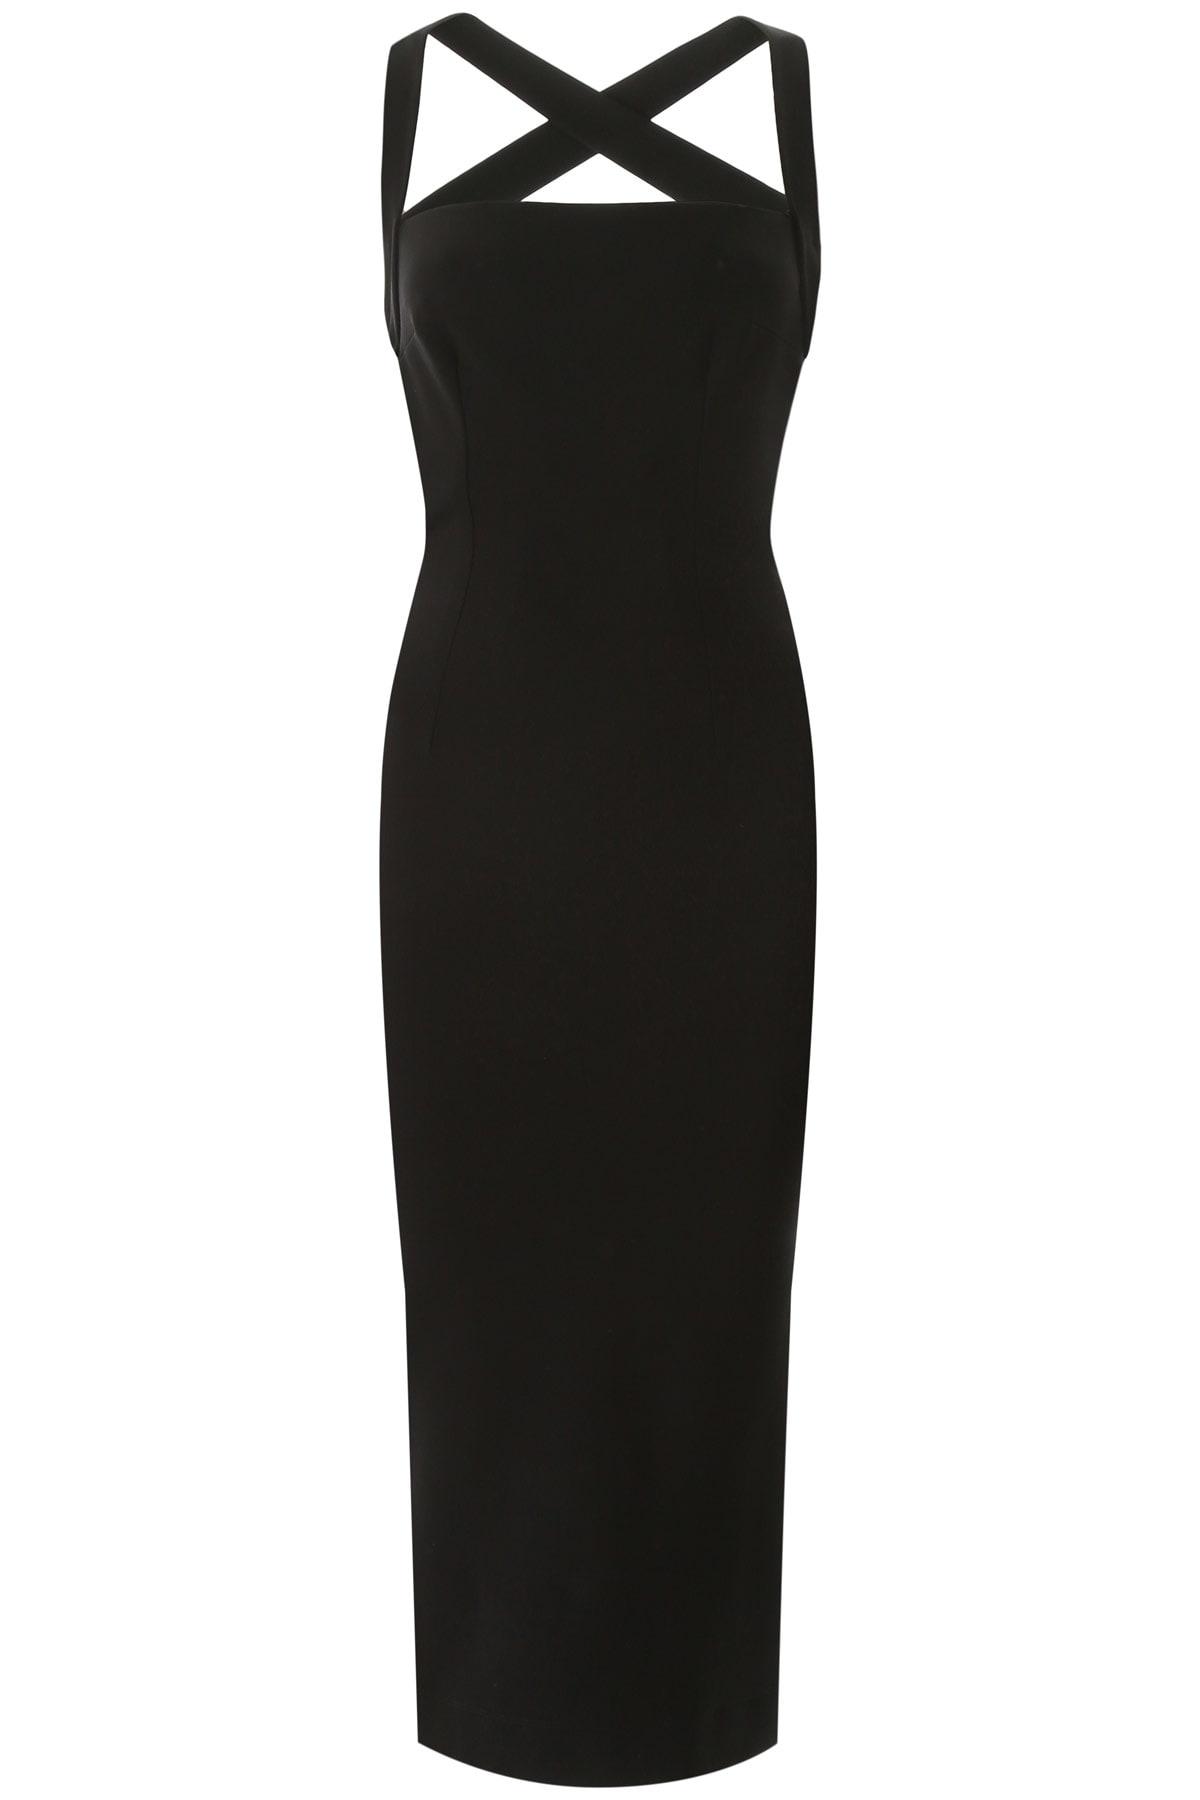 Buy Dolce & Gabbana Jersey Midi Dress online, shop Dolce & Gabbana with free shipping